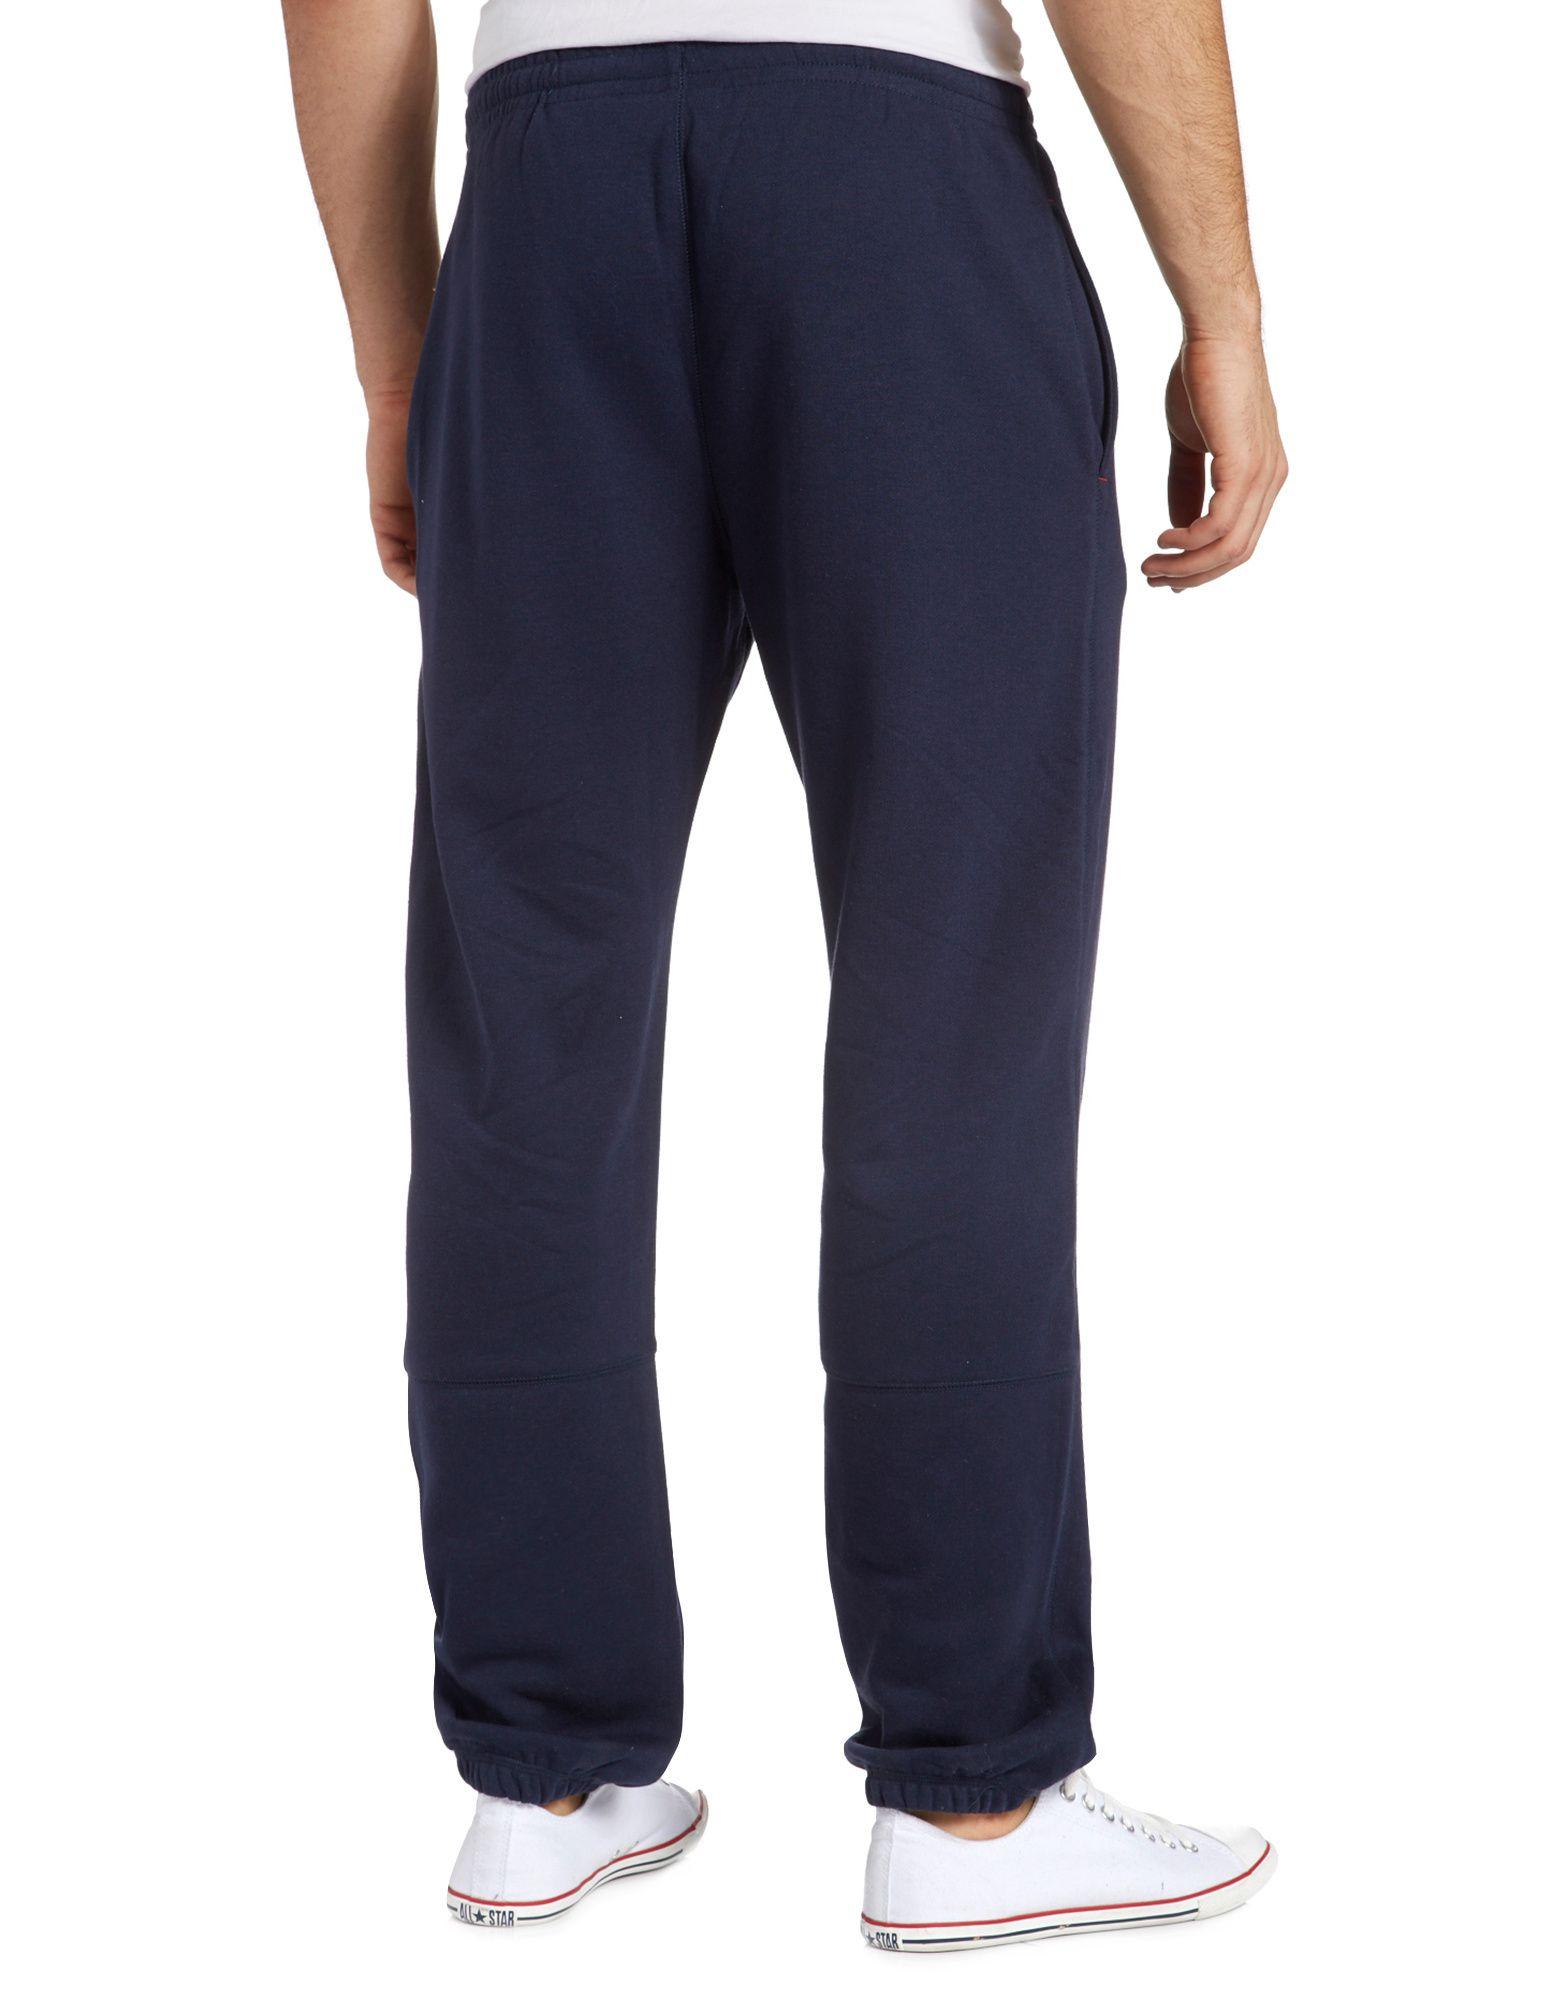 McKenzie Lenny Fleece Pants